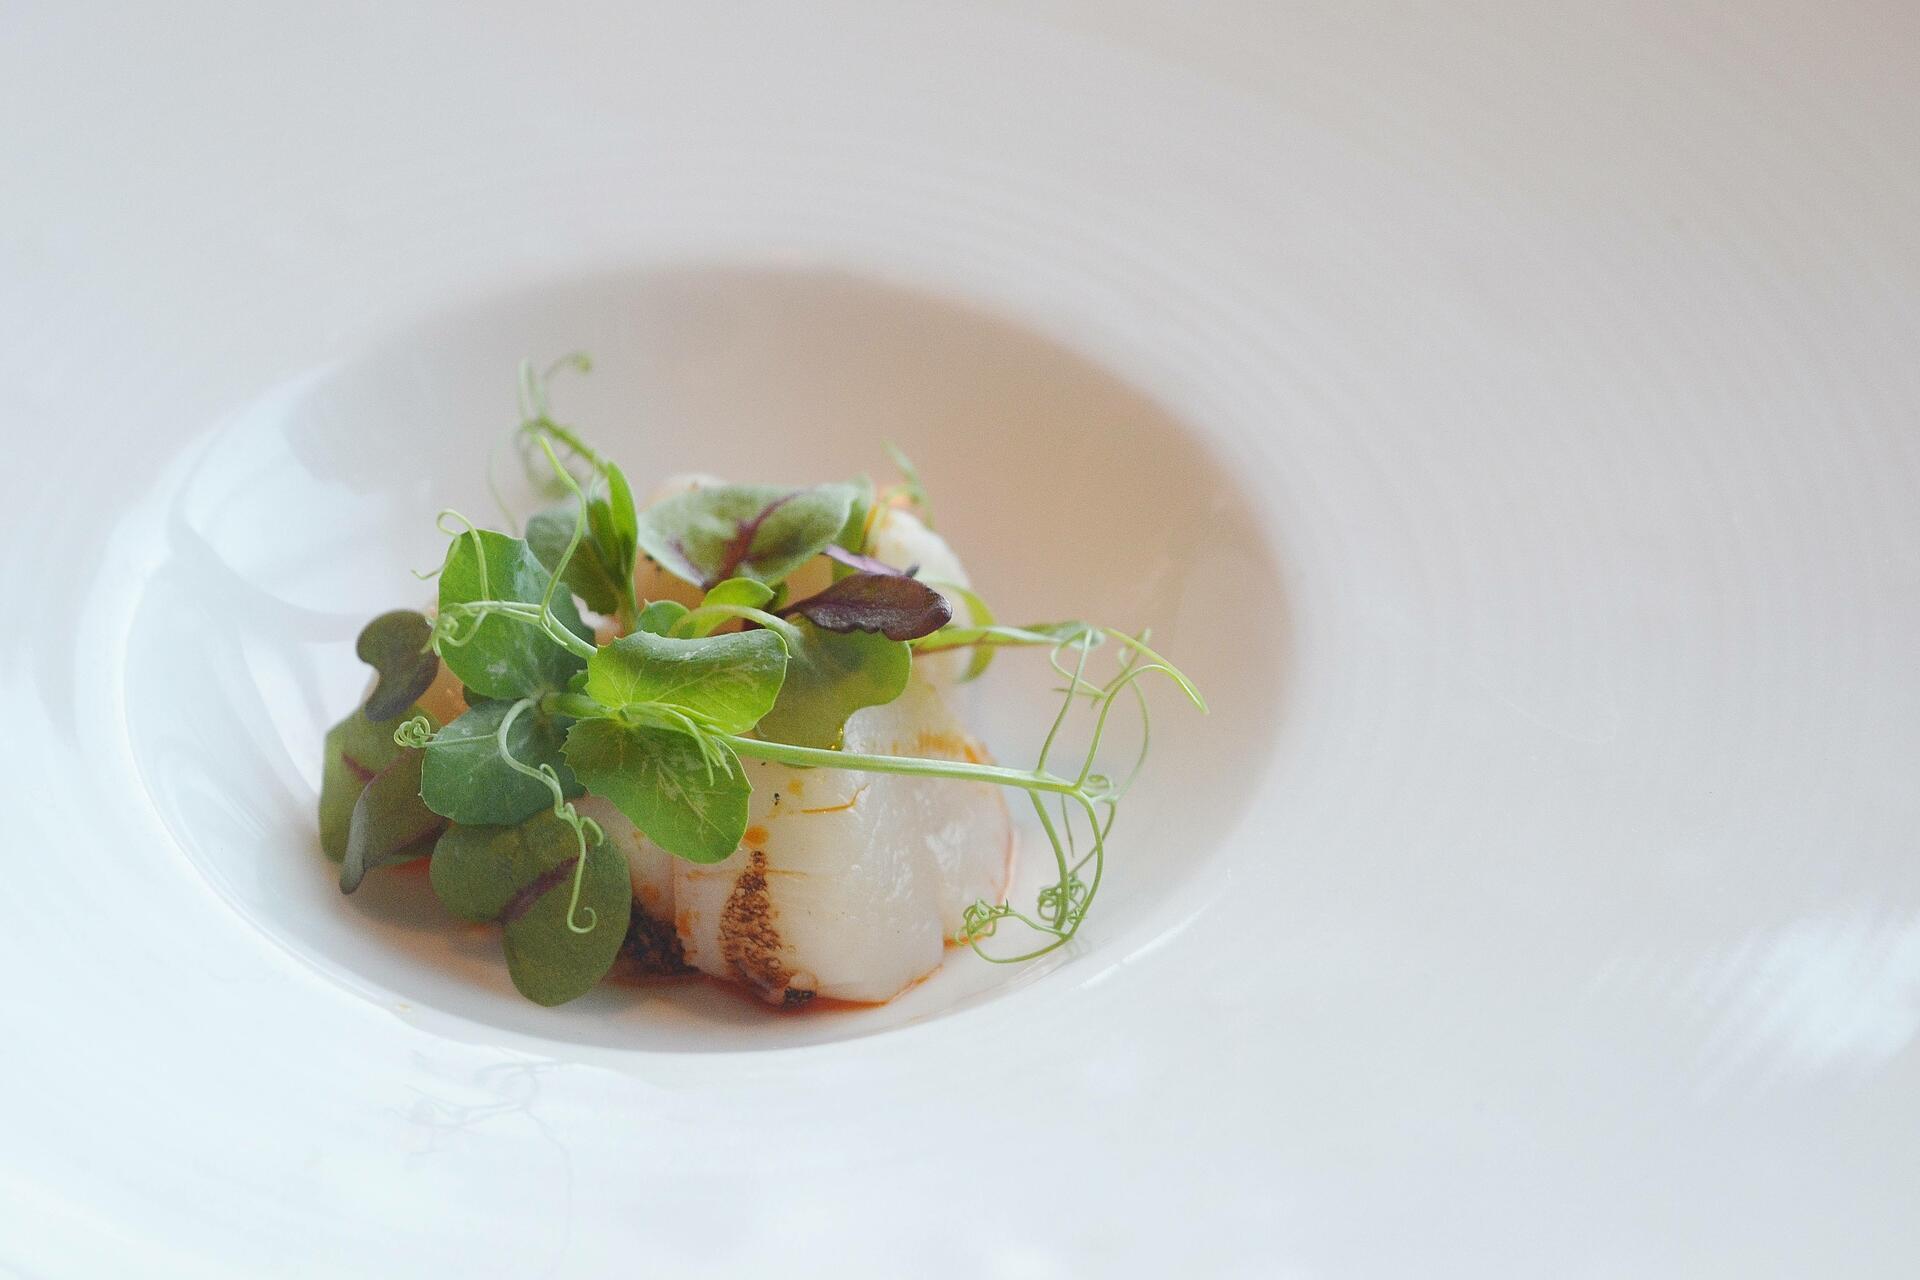 Light scallops dish